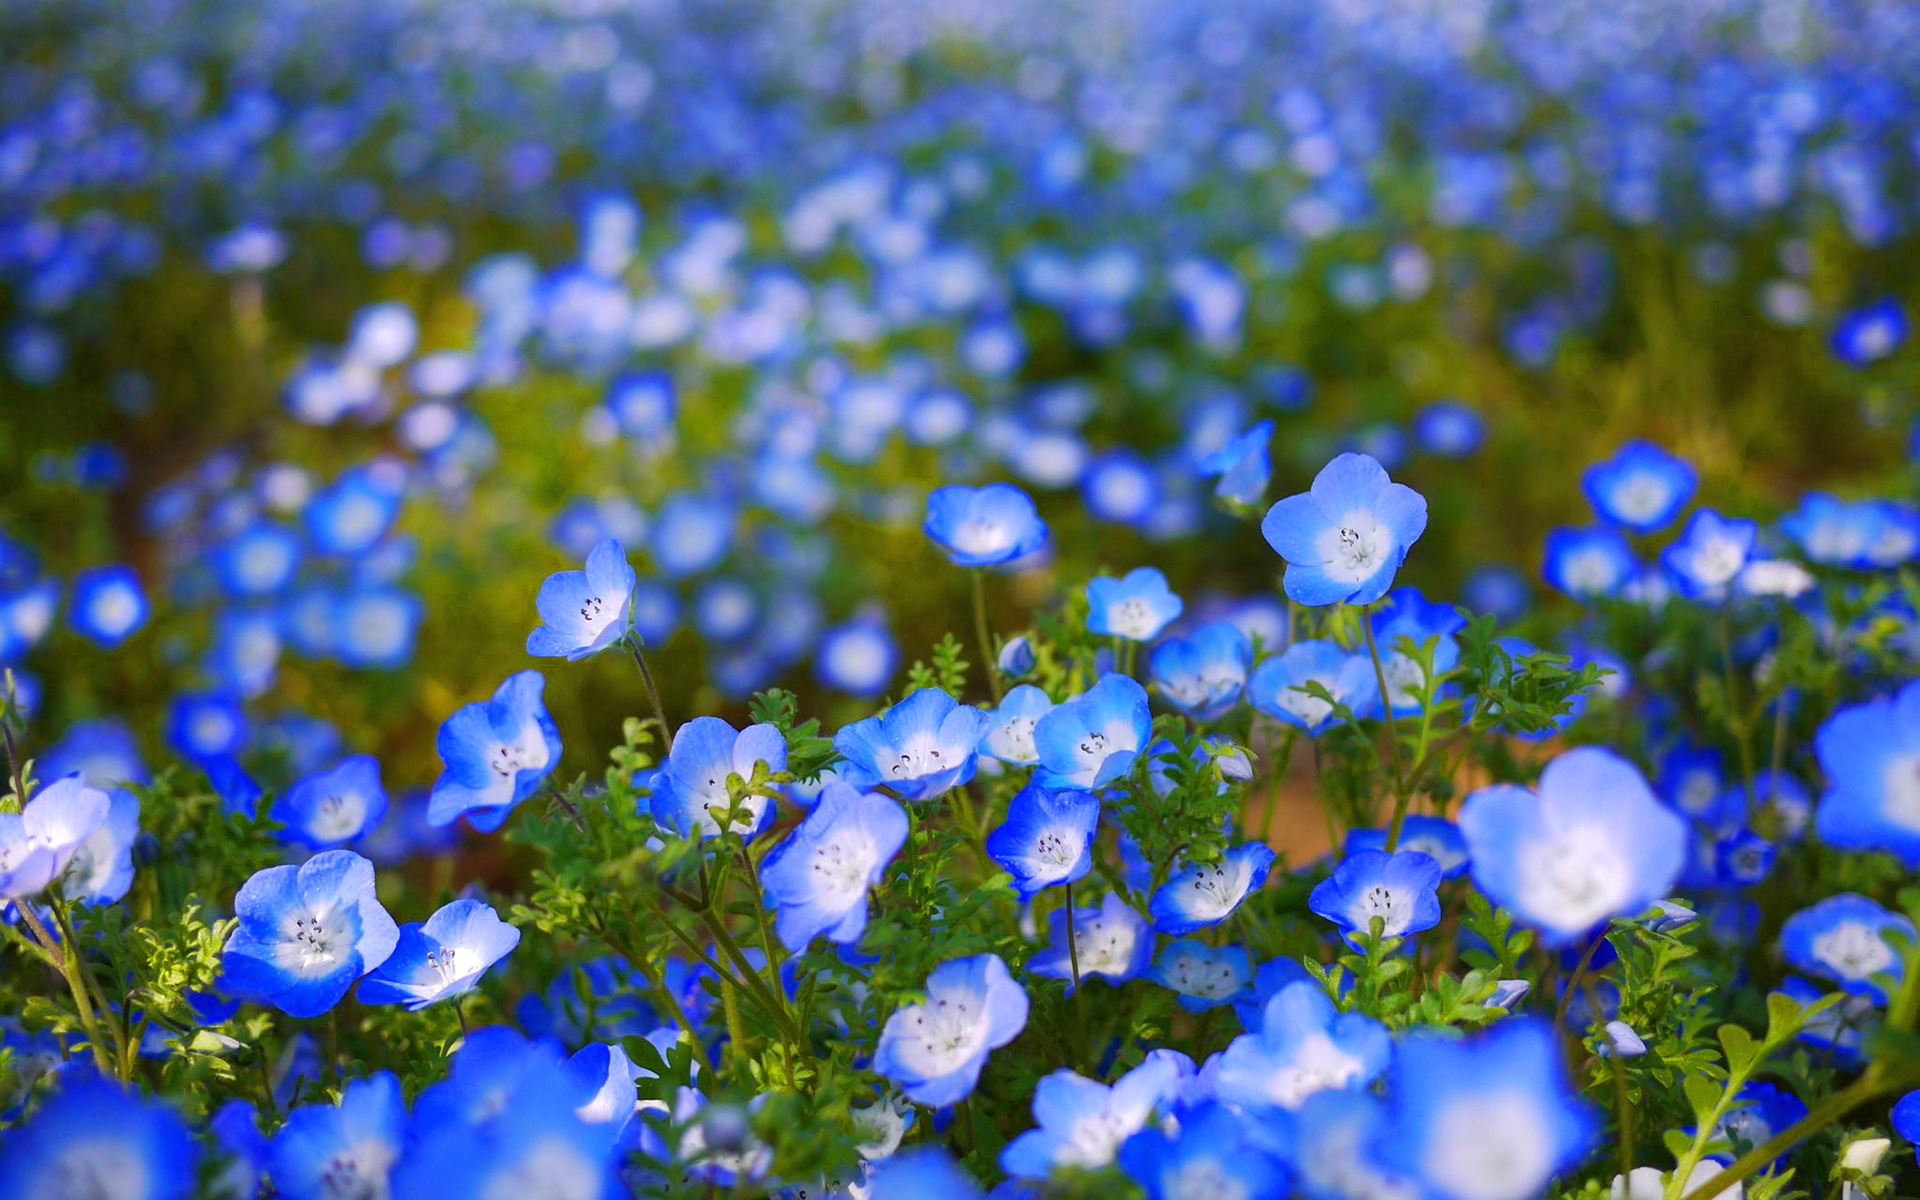 Blue Flower HD Wallpapers 1920x1200